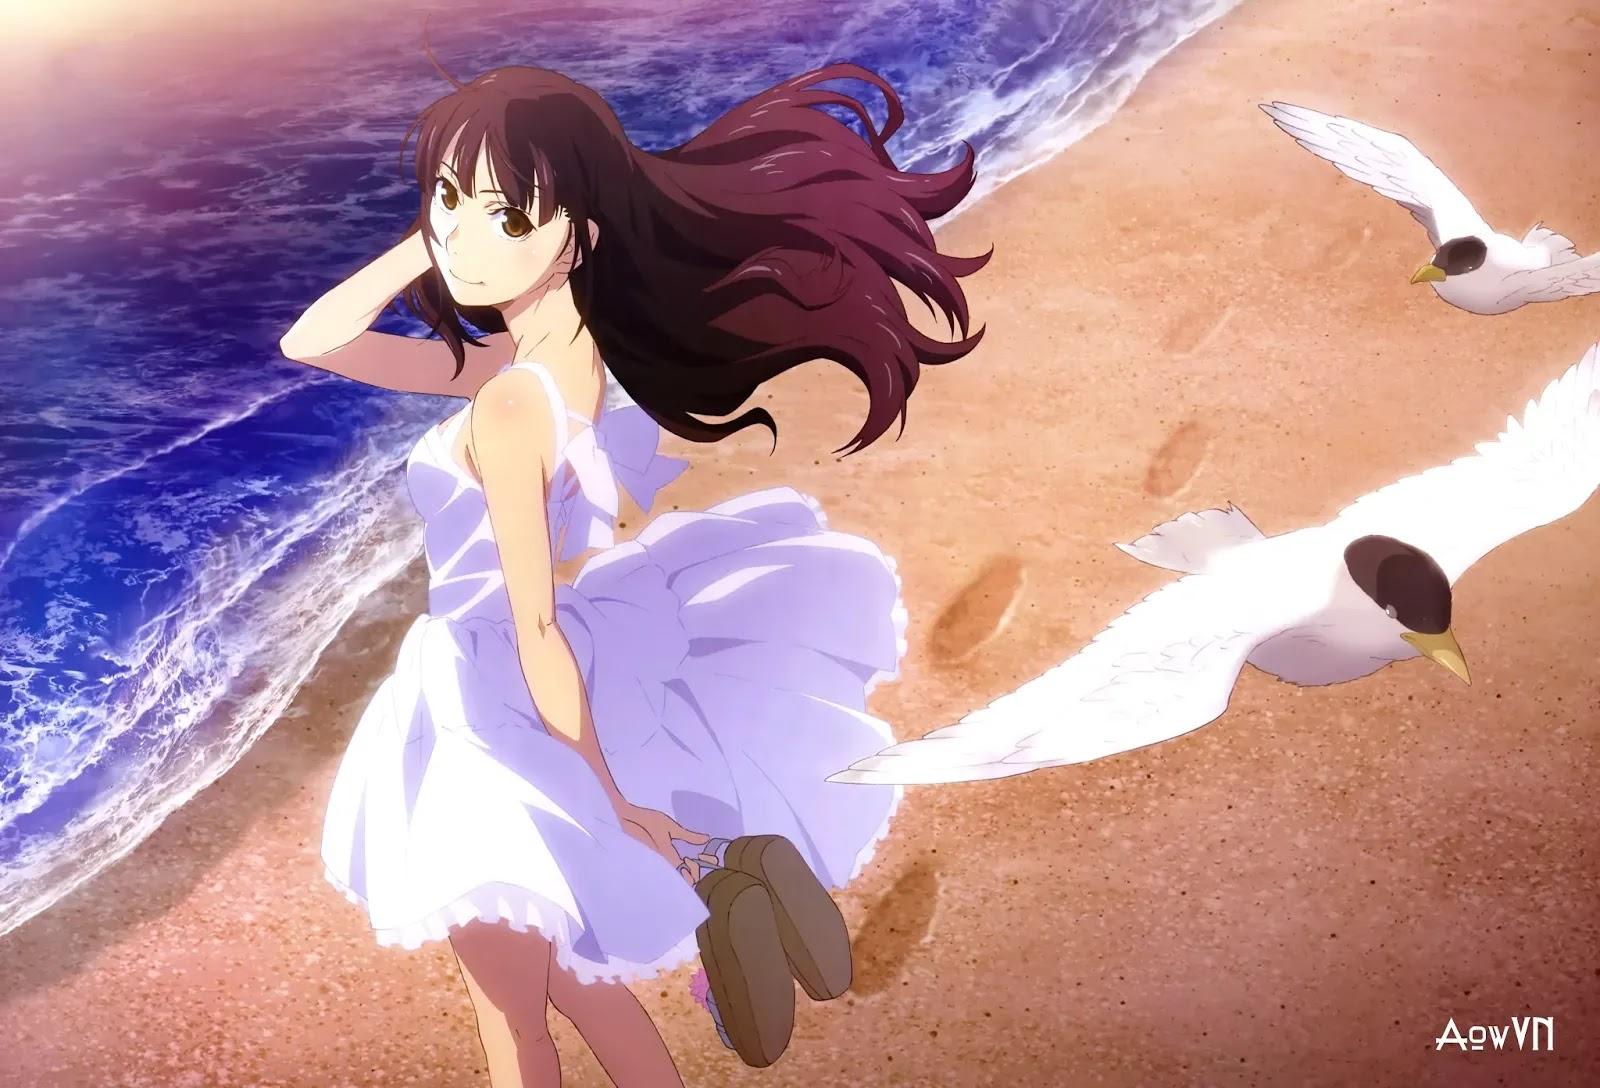 AowVN.org minz%2B%25285%2529 - [ Hình Nền ] Anime Uchiage Hanabi Shita Kara Miru Ka cực đẹp | AowVN Wallpapers